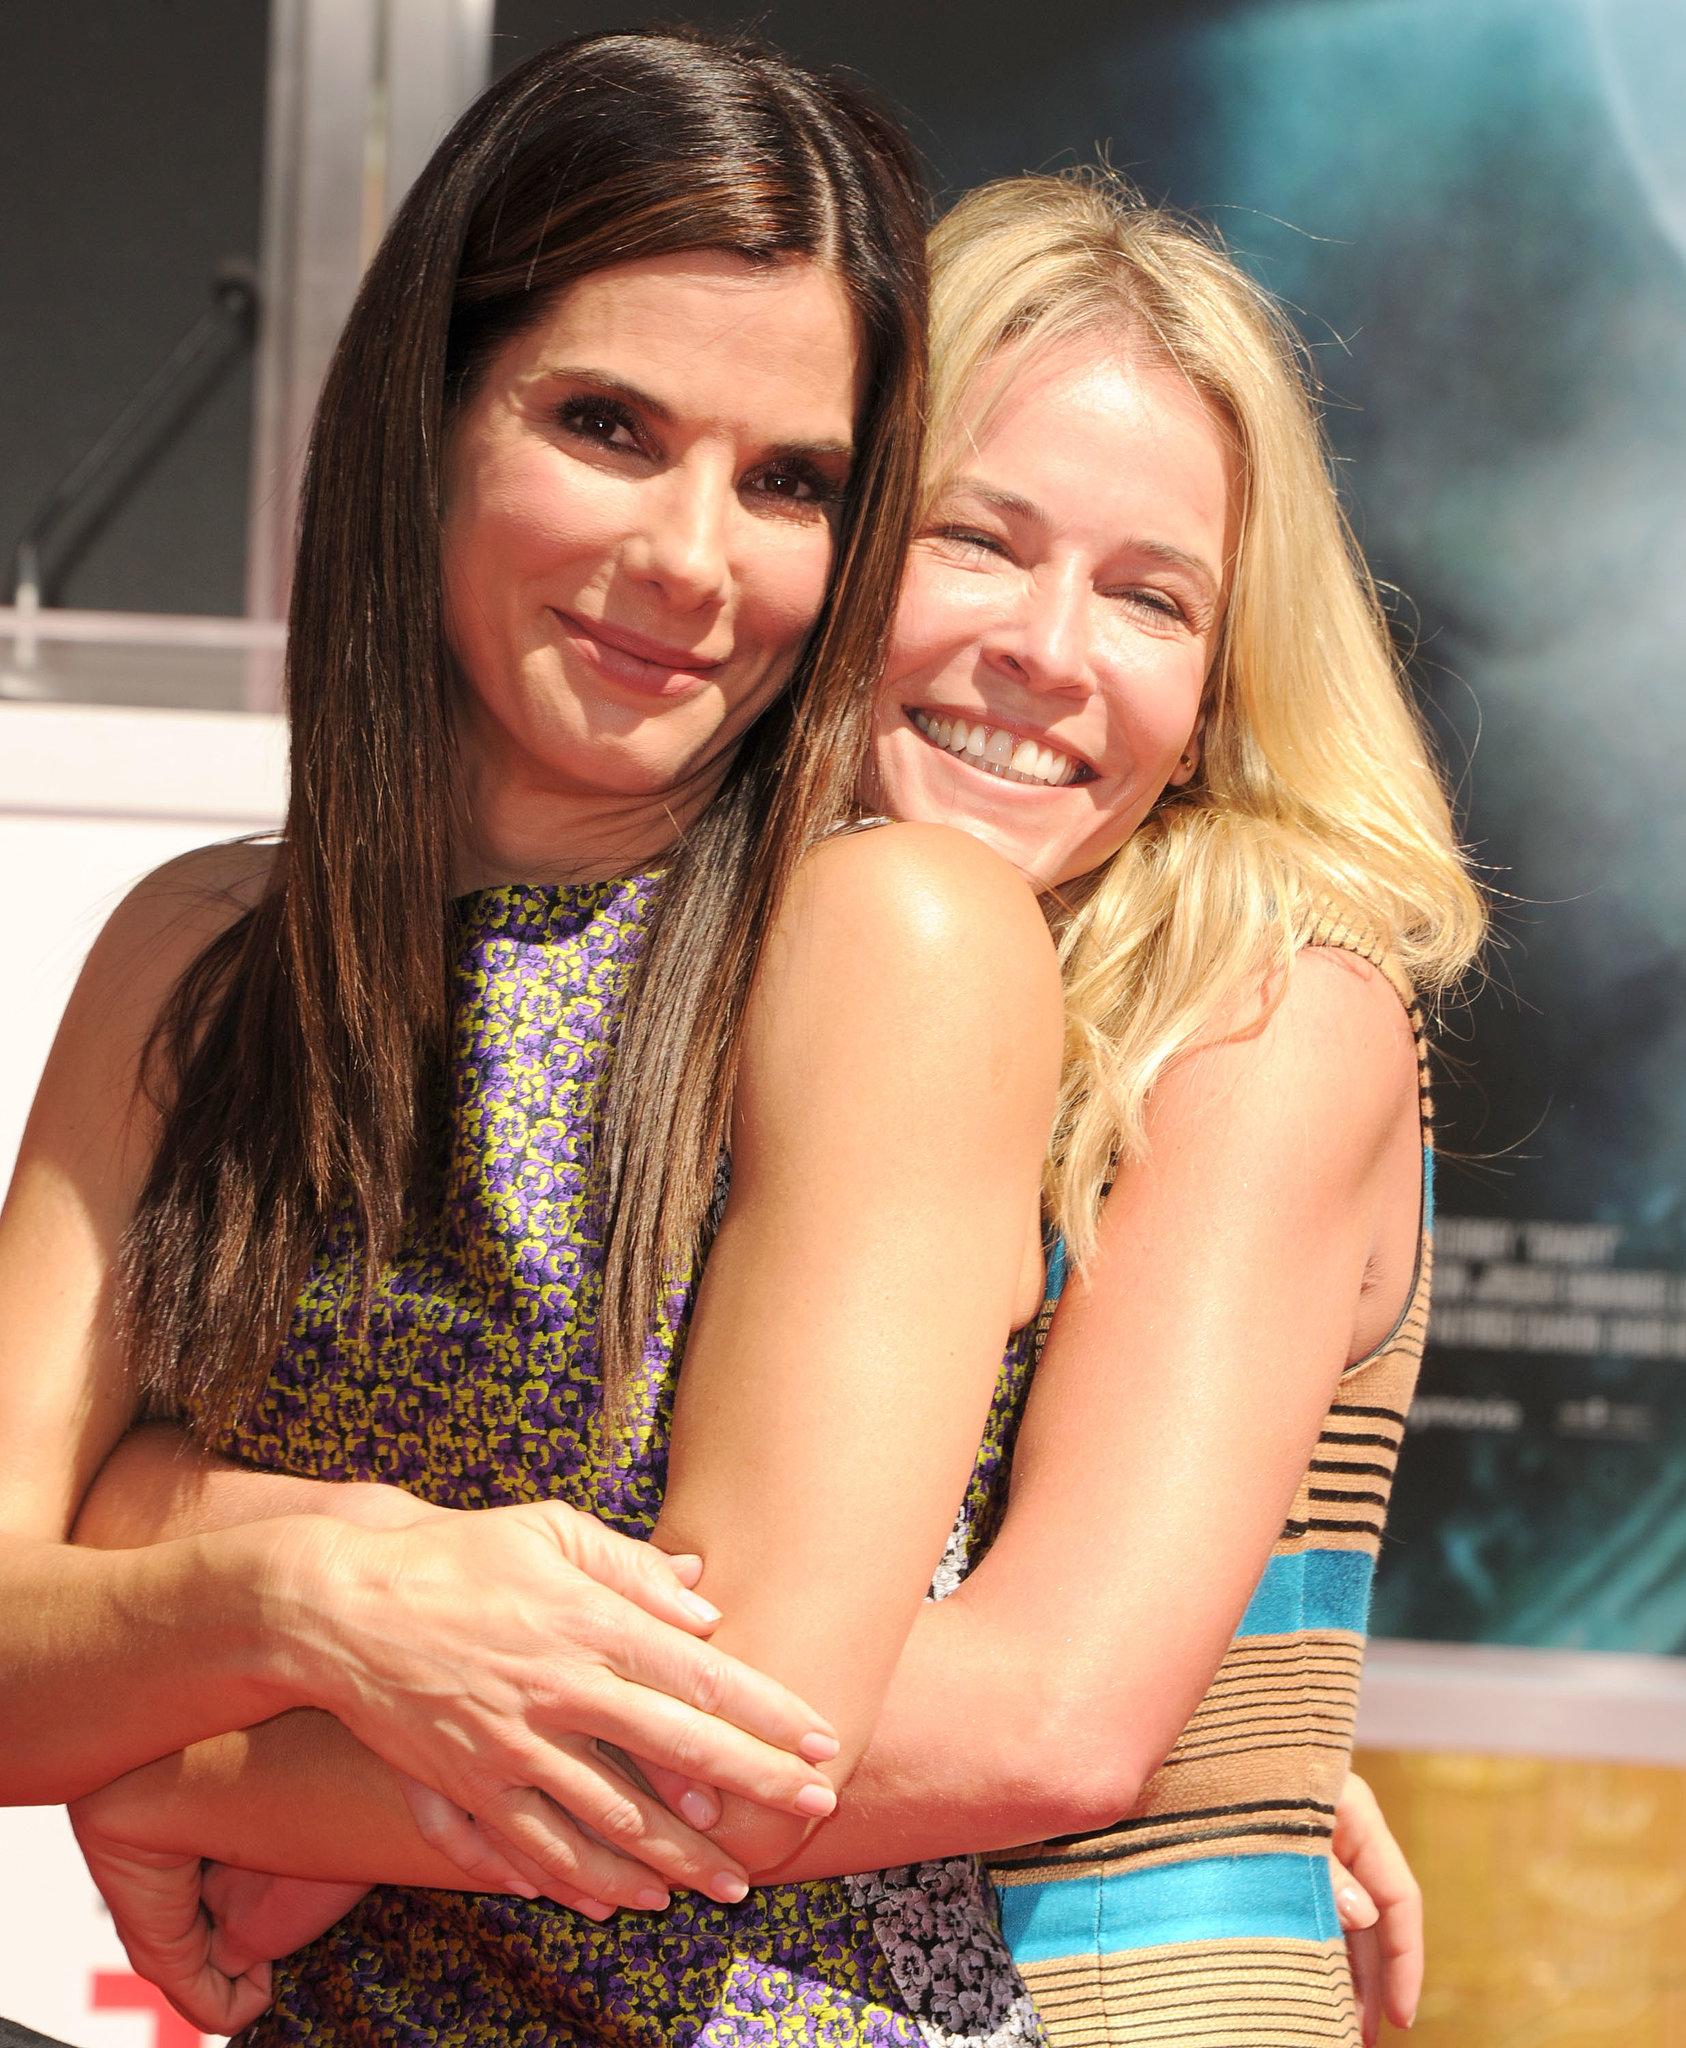 Chelsea Handler attended the benchmark event in support of Sandra Bullock.